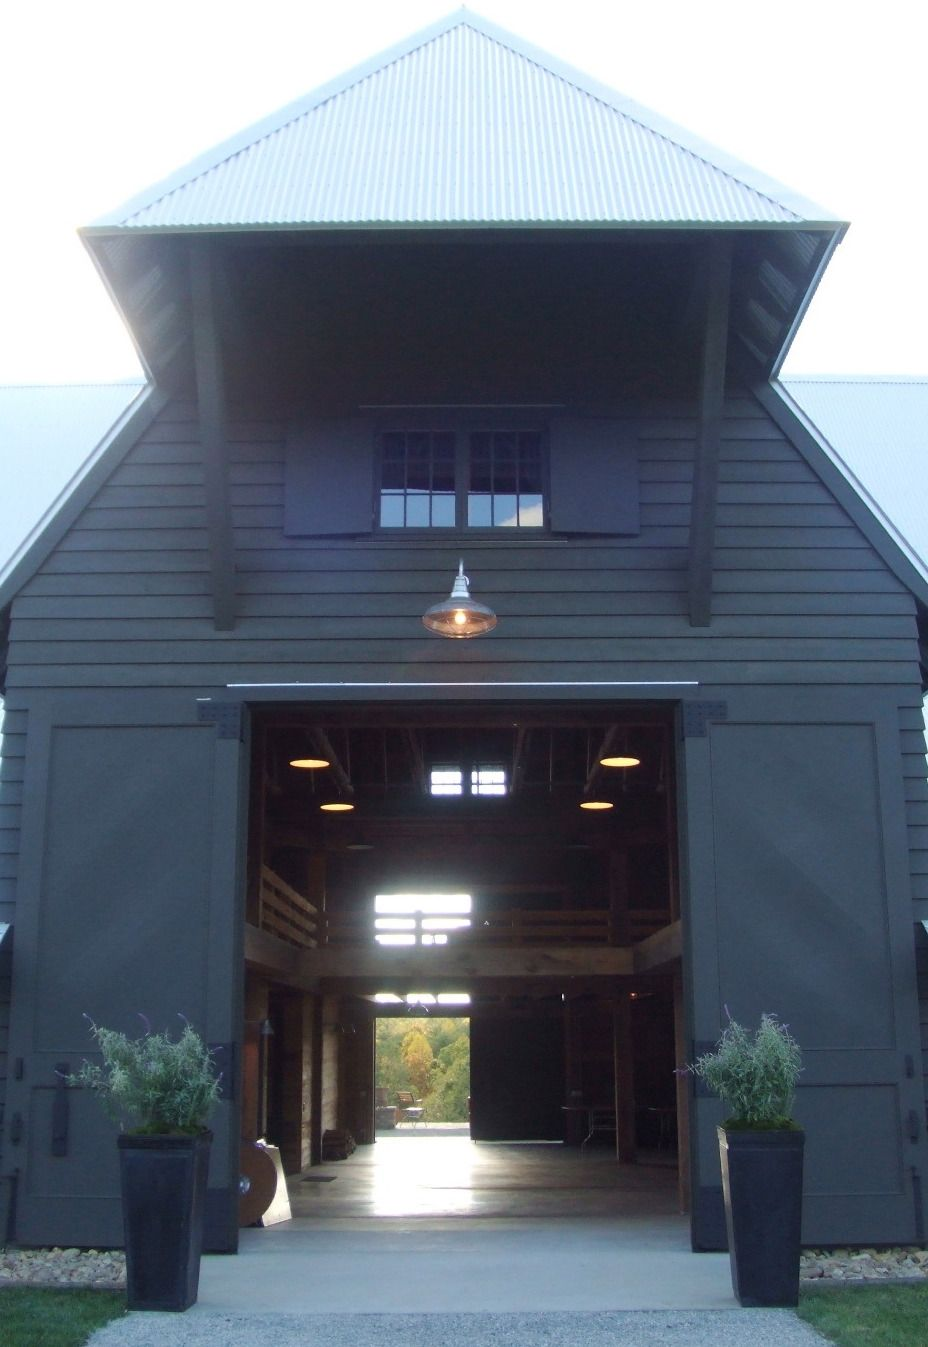 Modern barn dreamy environs pinterest - The contemporary barn ...